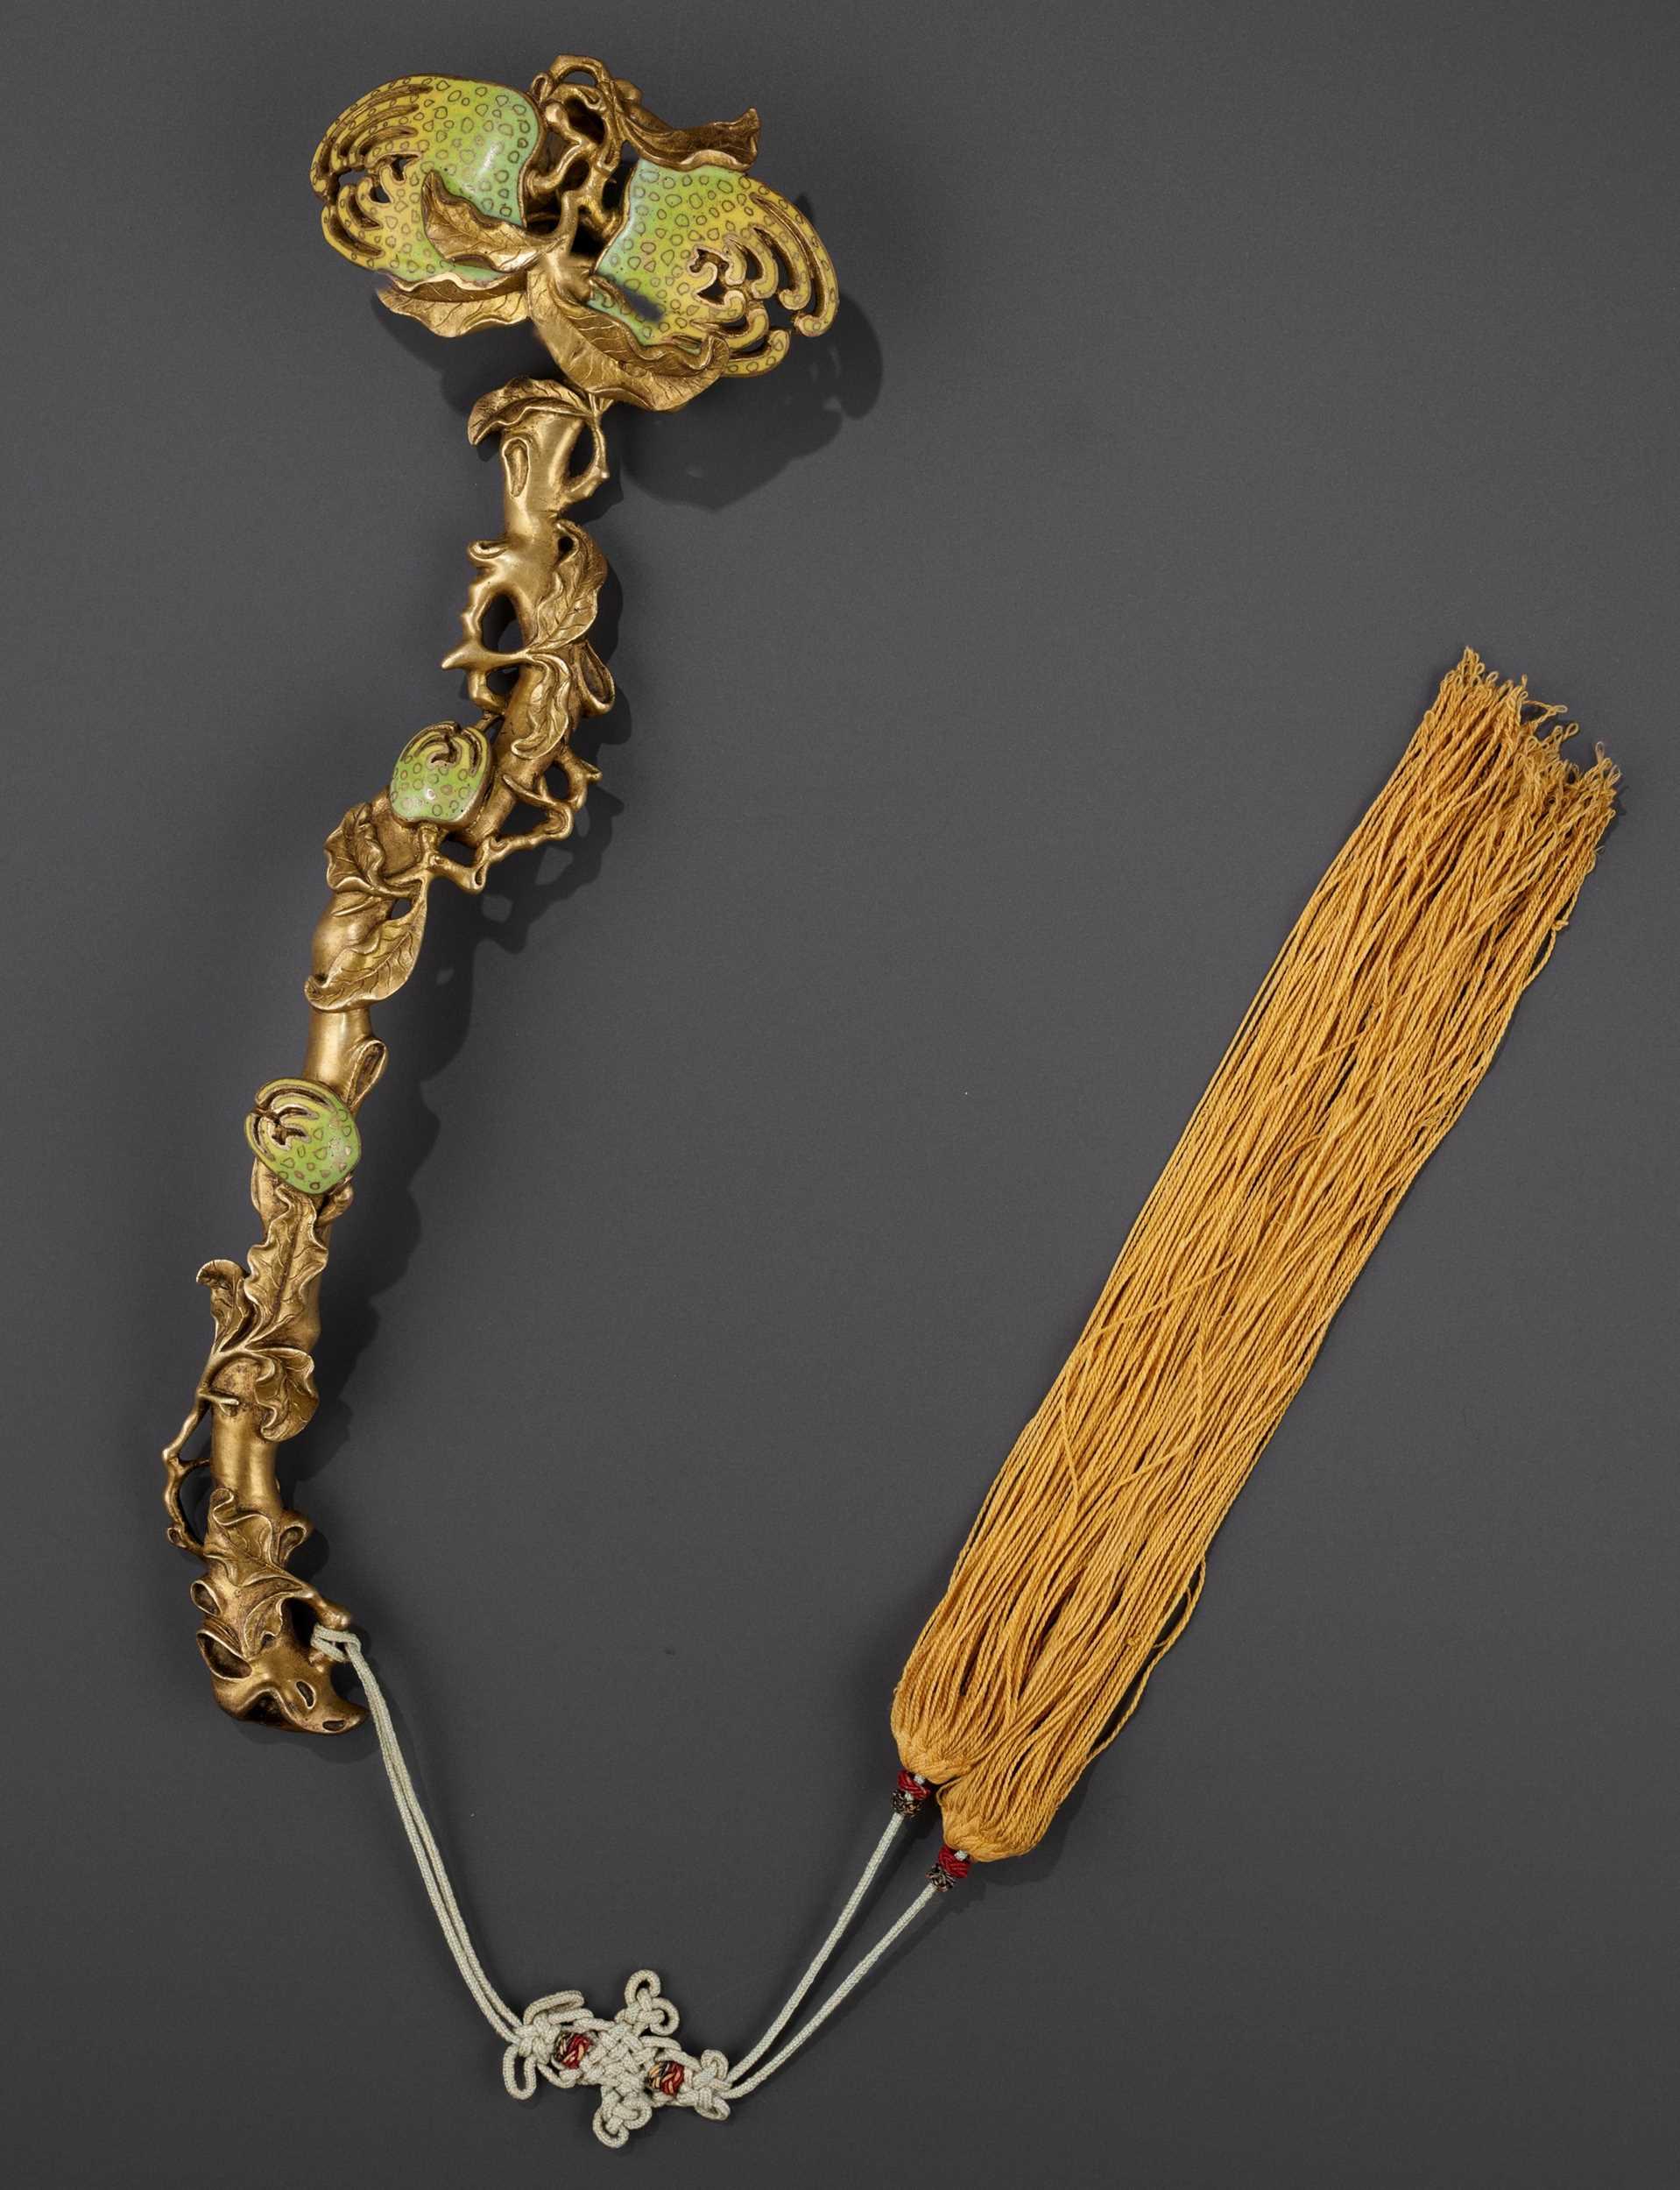 Lot 7 - A CHAMPLEVÉ ENAMEL 'BUDDHA'S HAND' RUYI SCEPTER, QING DYNASTY